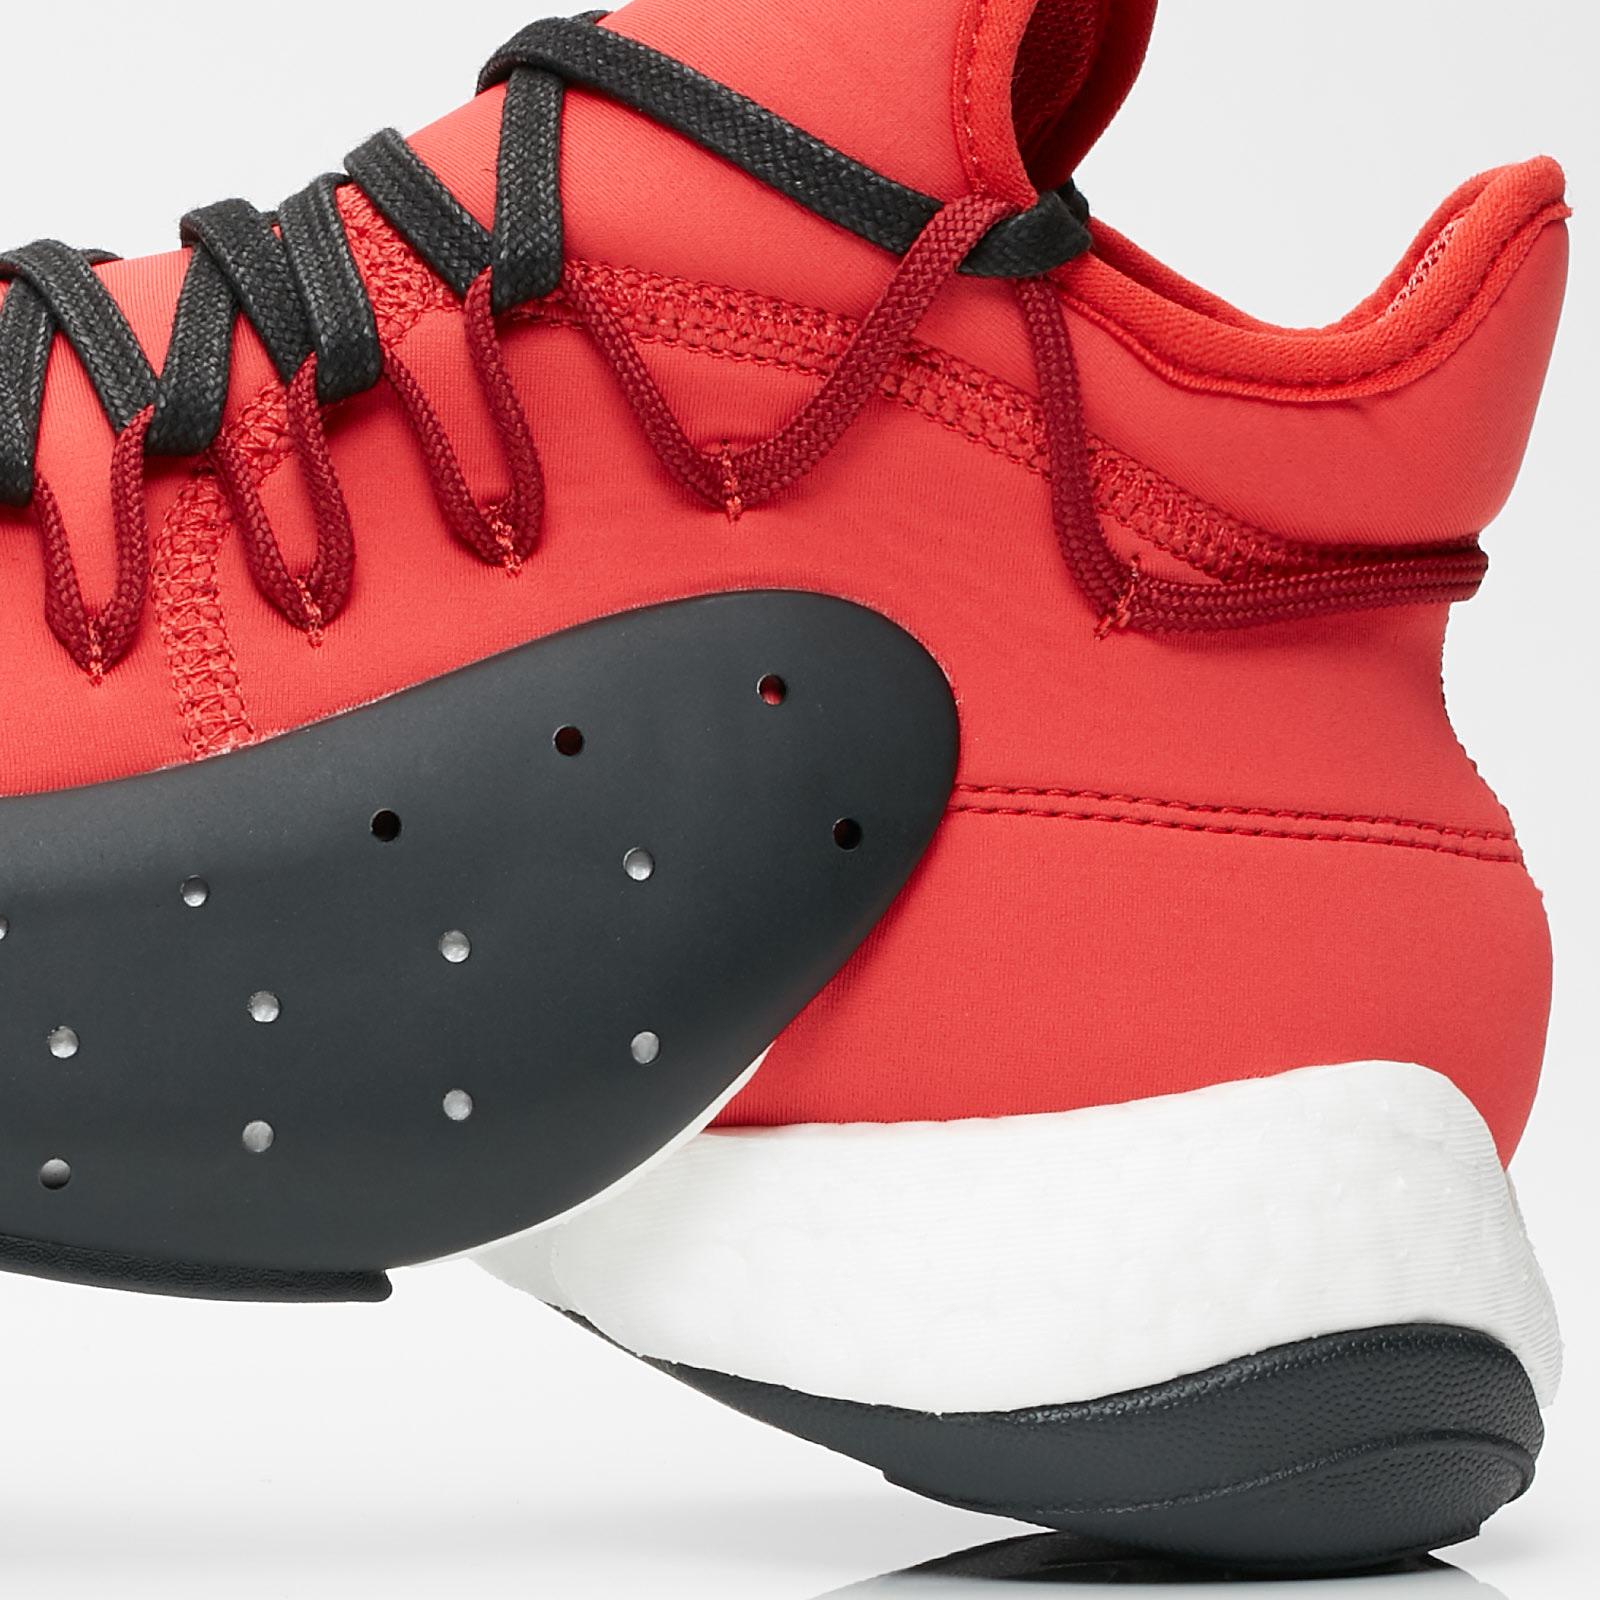 155224dc33b75 adidas Y-3 BYW Bball - Bc0338 - Sneakersnstuff